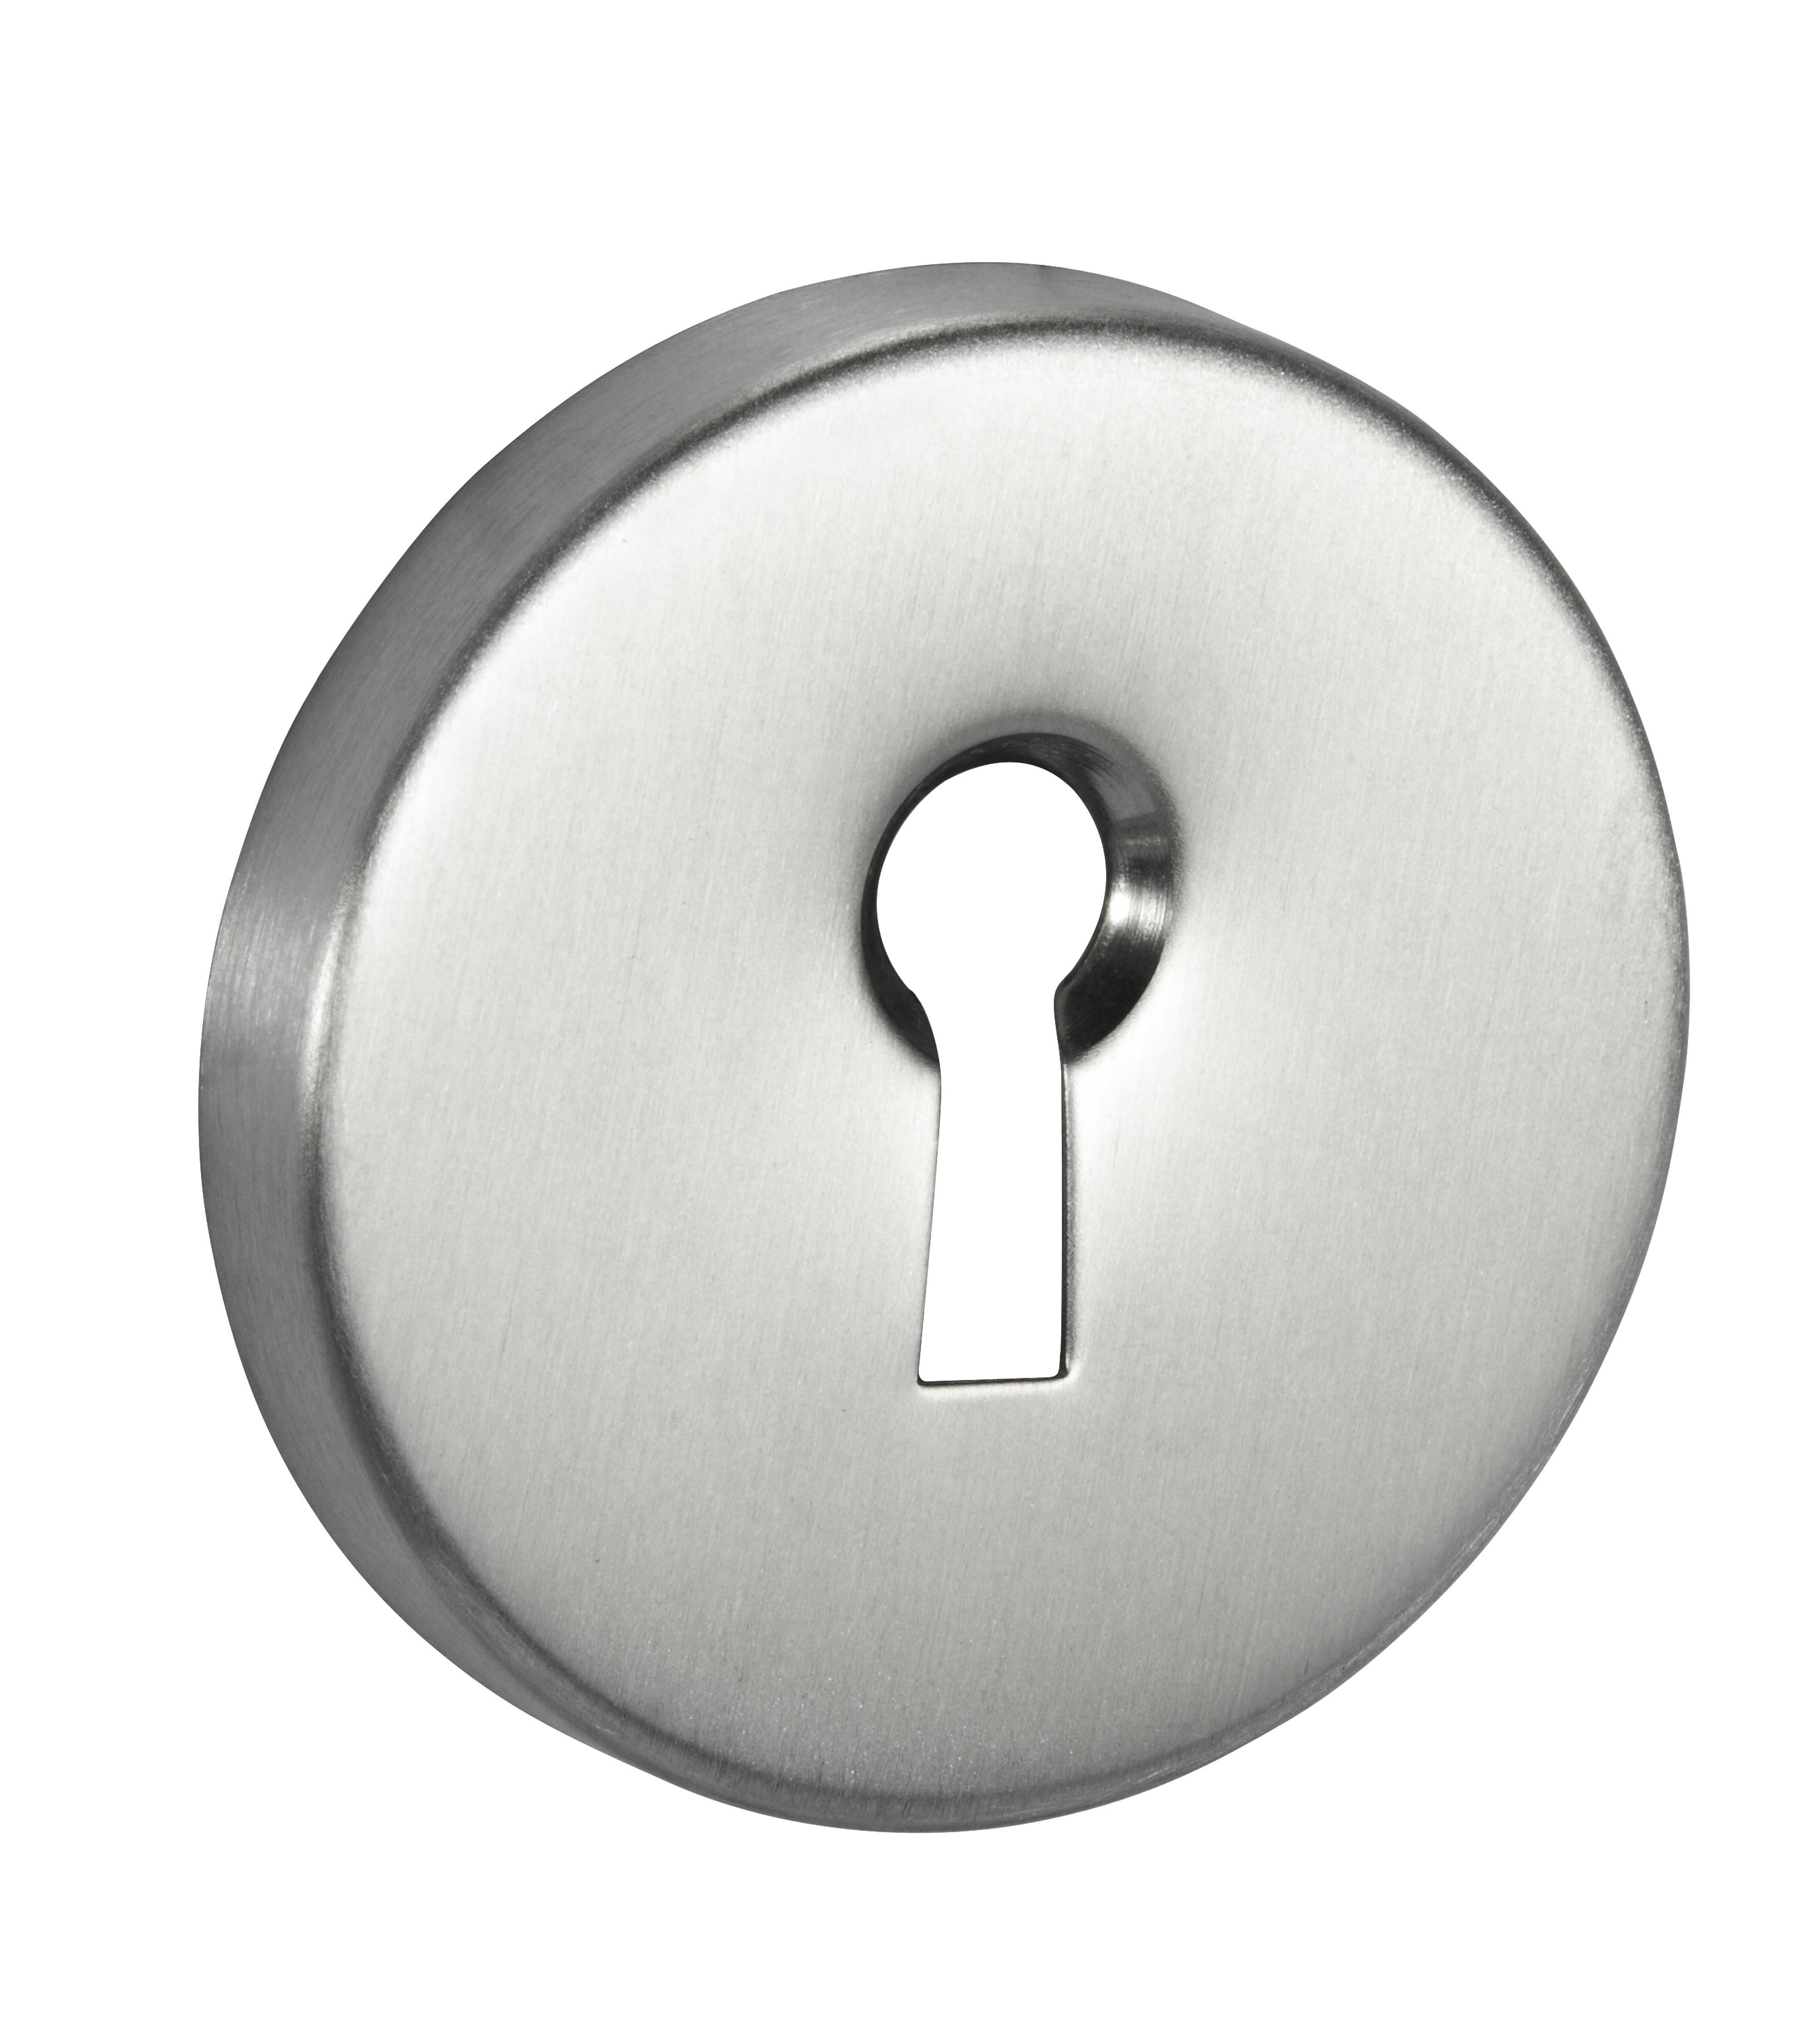 1000LK - Lever Key Escutcheon